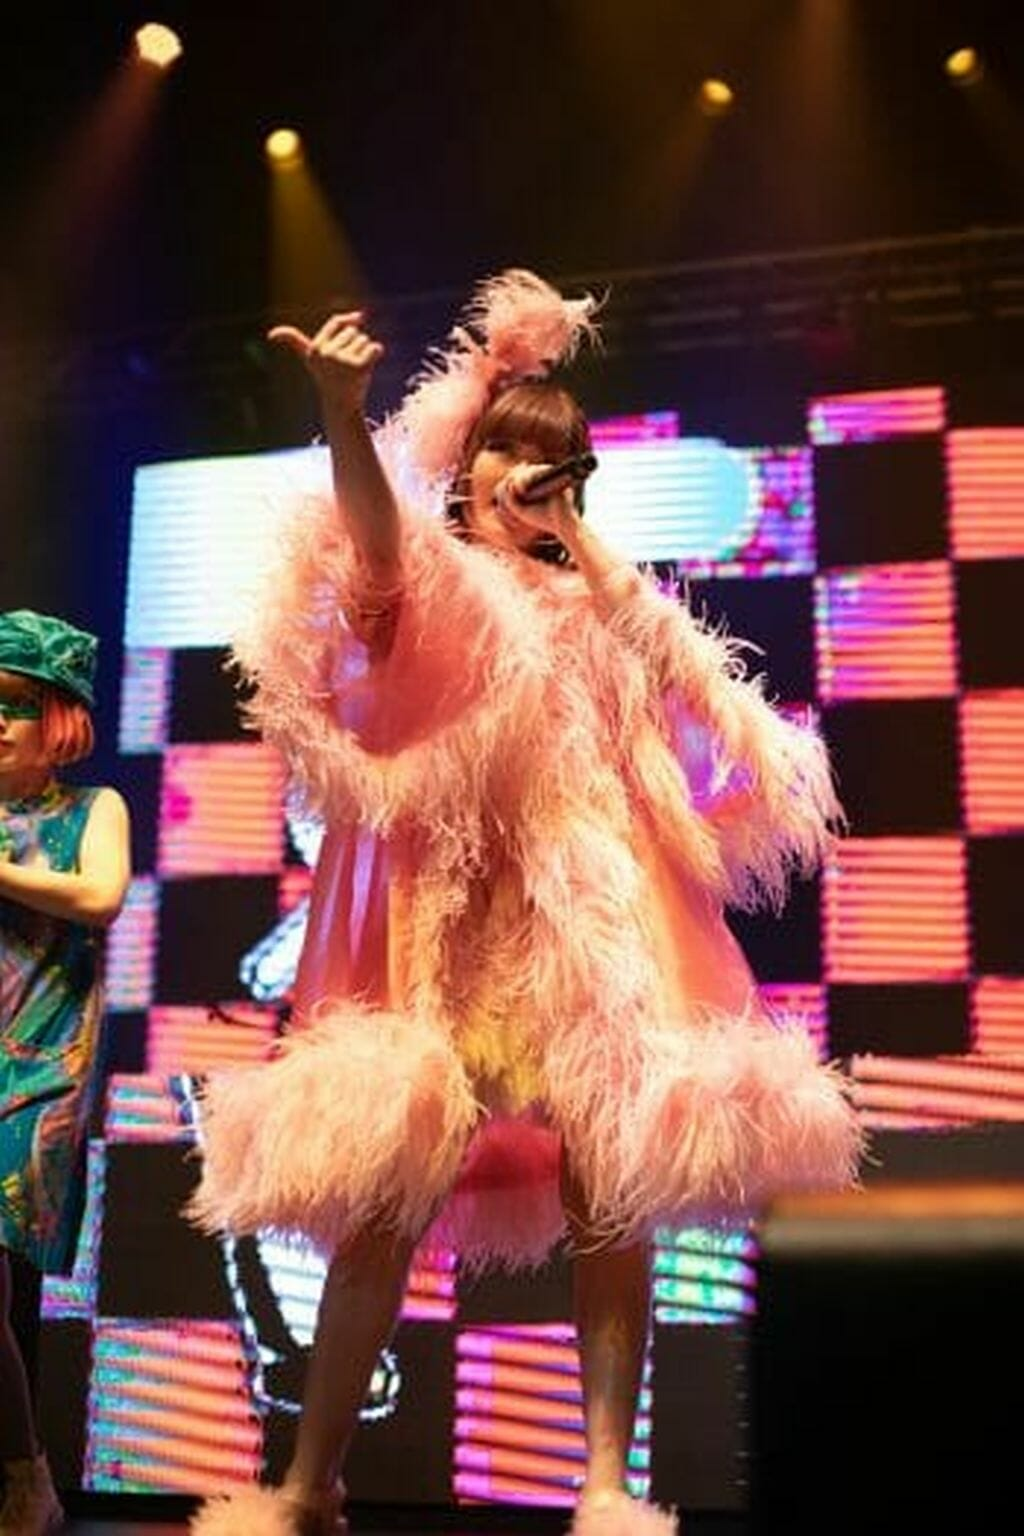 Kyary Pamyu Pamyu Performs At Otaquest 2019 At LA Live